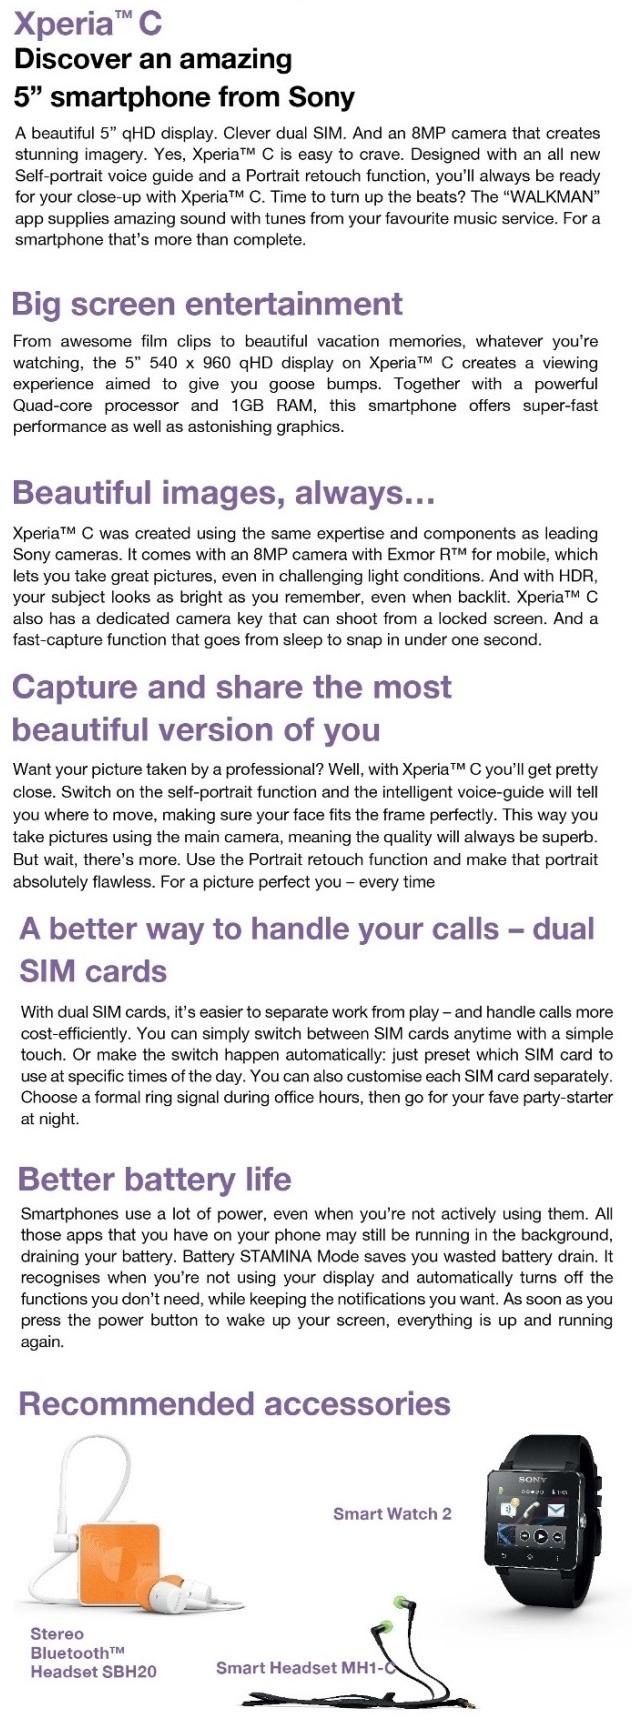 https://www.phoneworld.com.pk/wp-content/uploads/2014/06/Xperia-C-DL-Leaflet1-ZONG-02.jpg